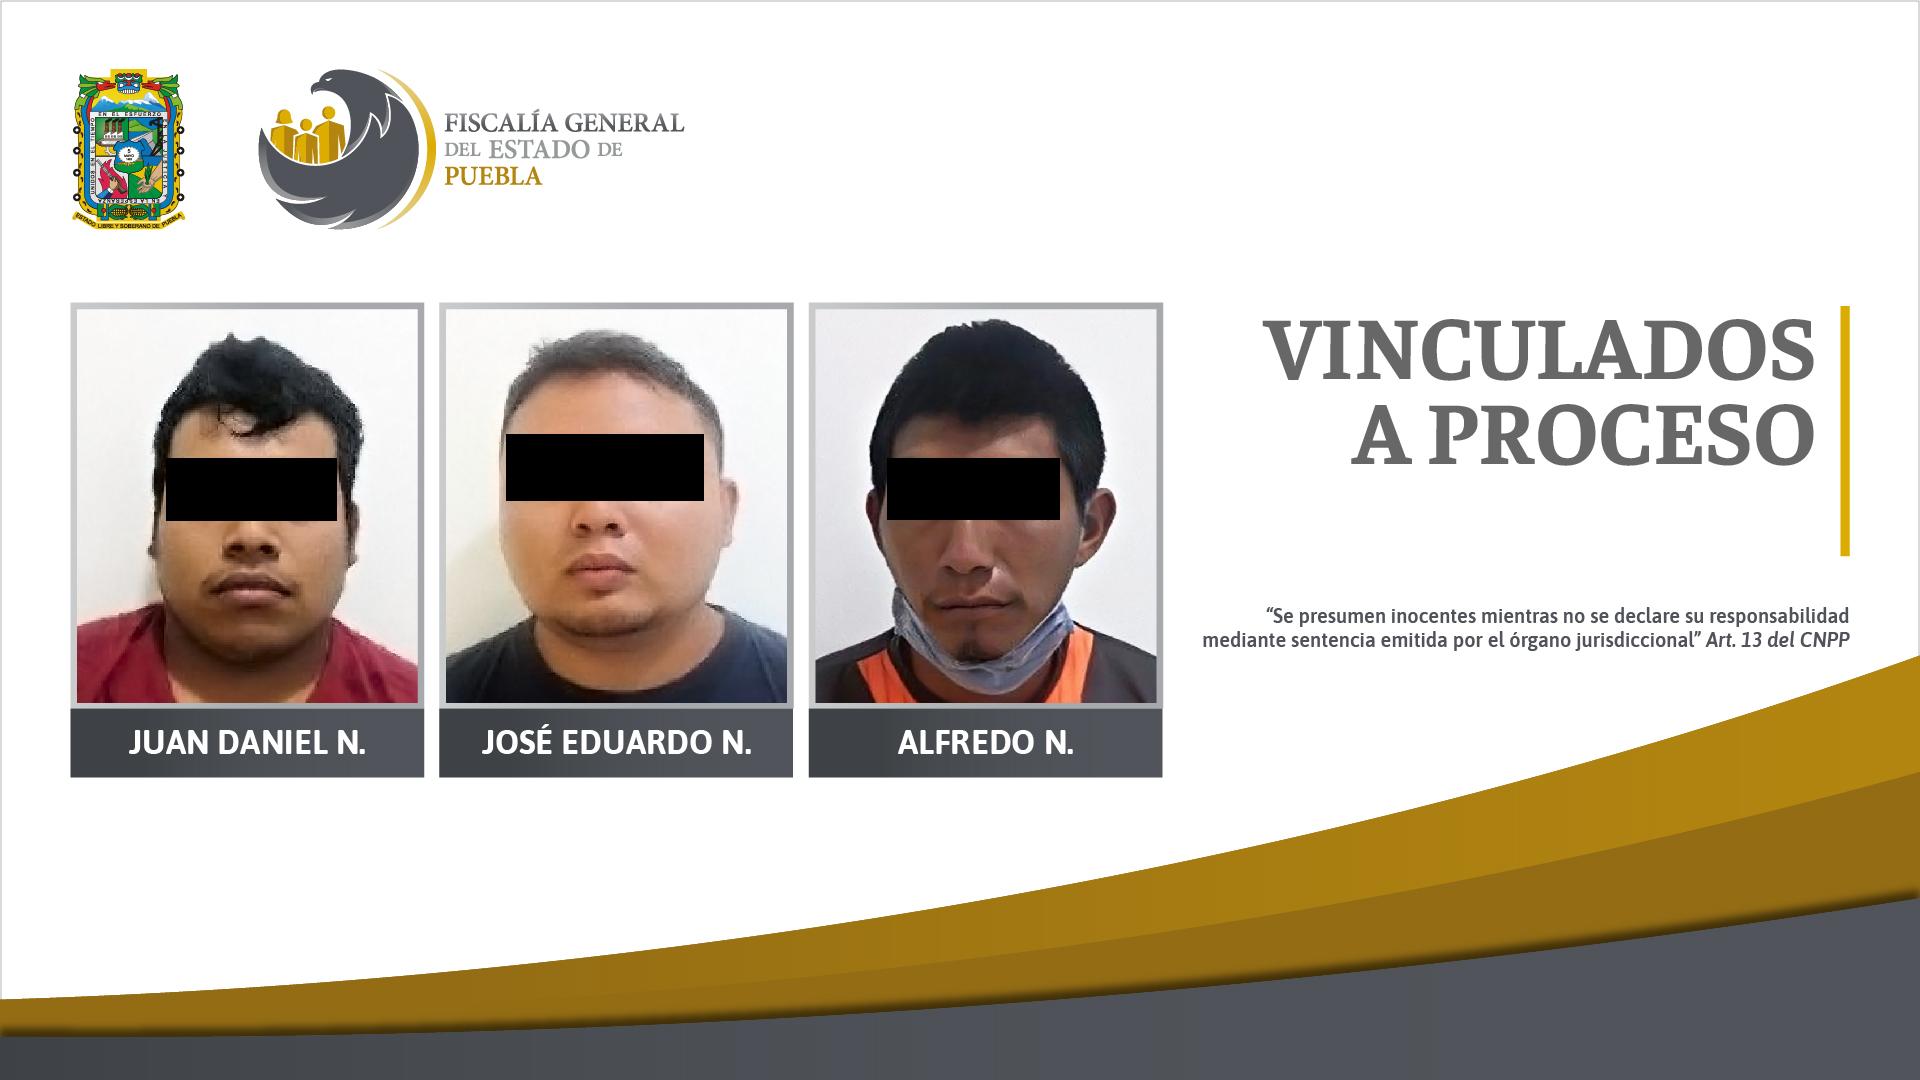 Vinculados a proceso tres hombres detenidos en Lázaro Cárdenas